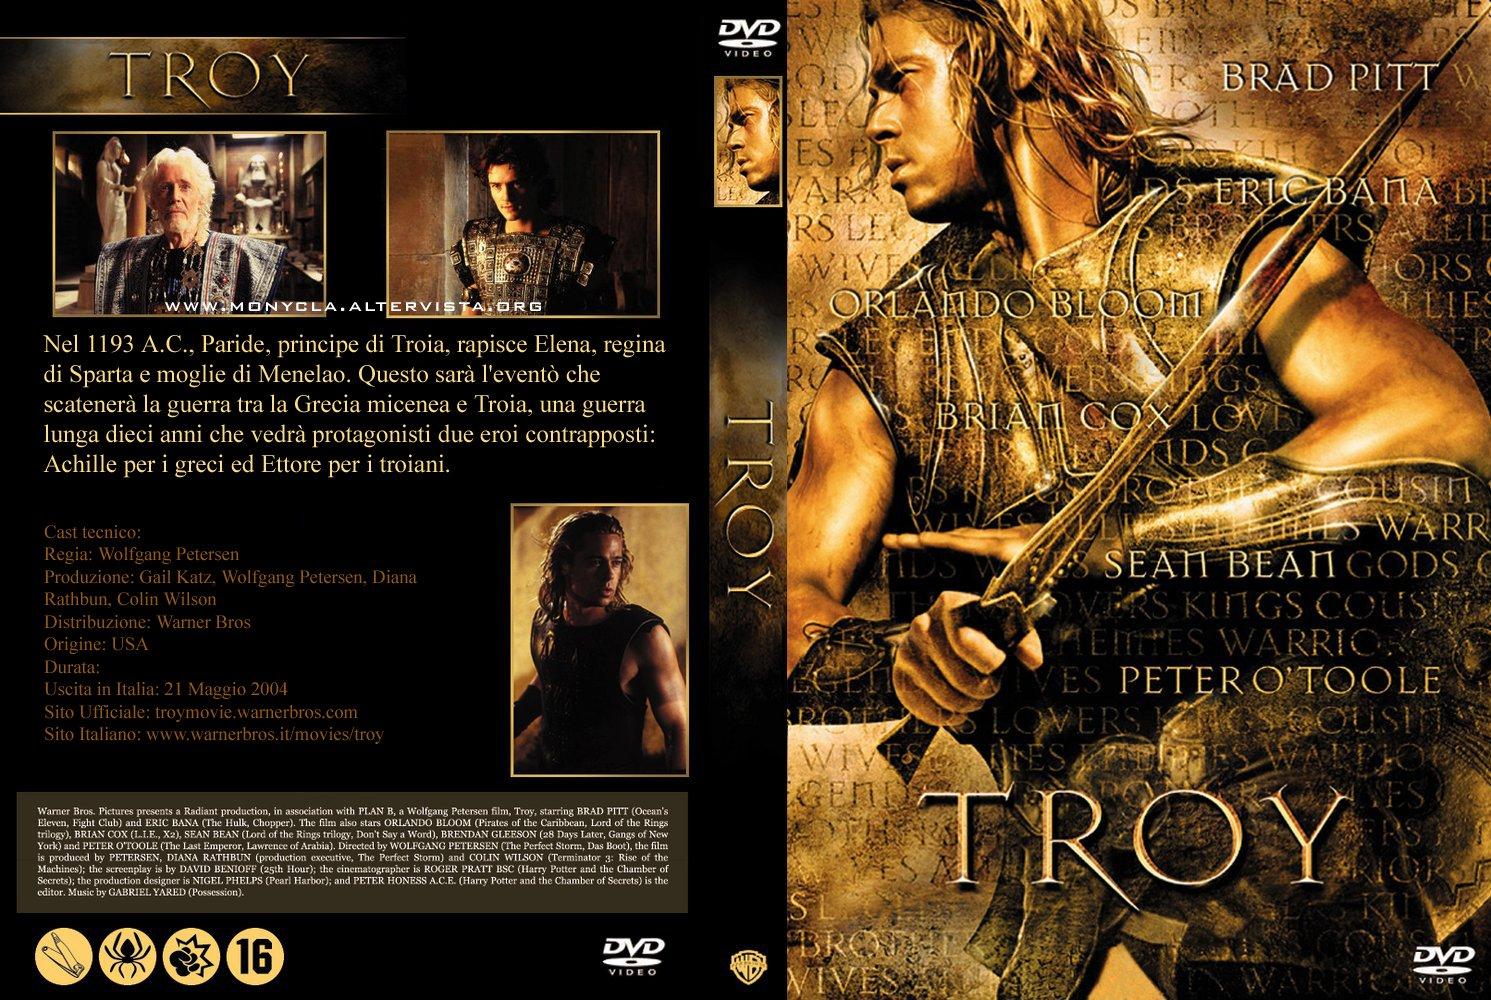 troy dvd italiano  DVD titoli by GRARIO